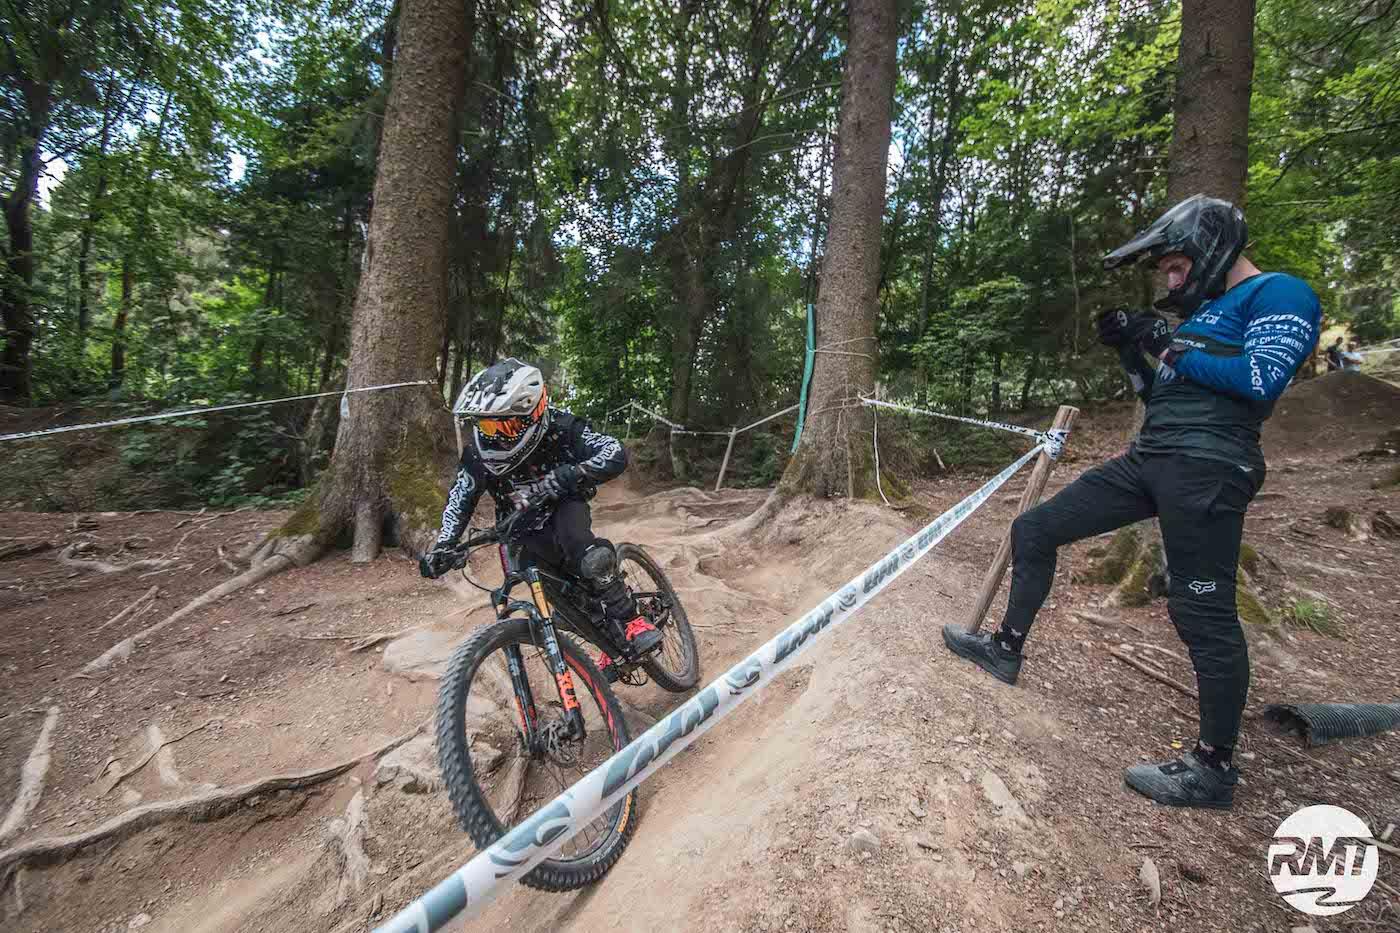 Bikepark Kinder Fahrtechnik Basic Kurs 8-12 Jahre Training Rock my Trail Kurs Bikeschule